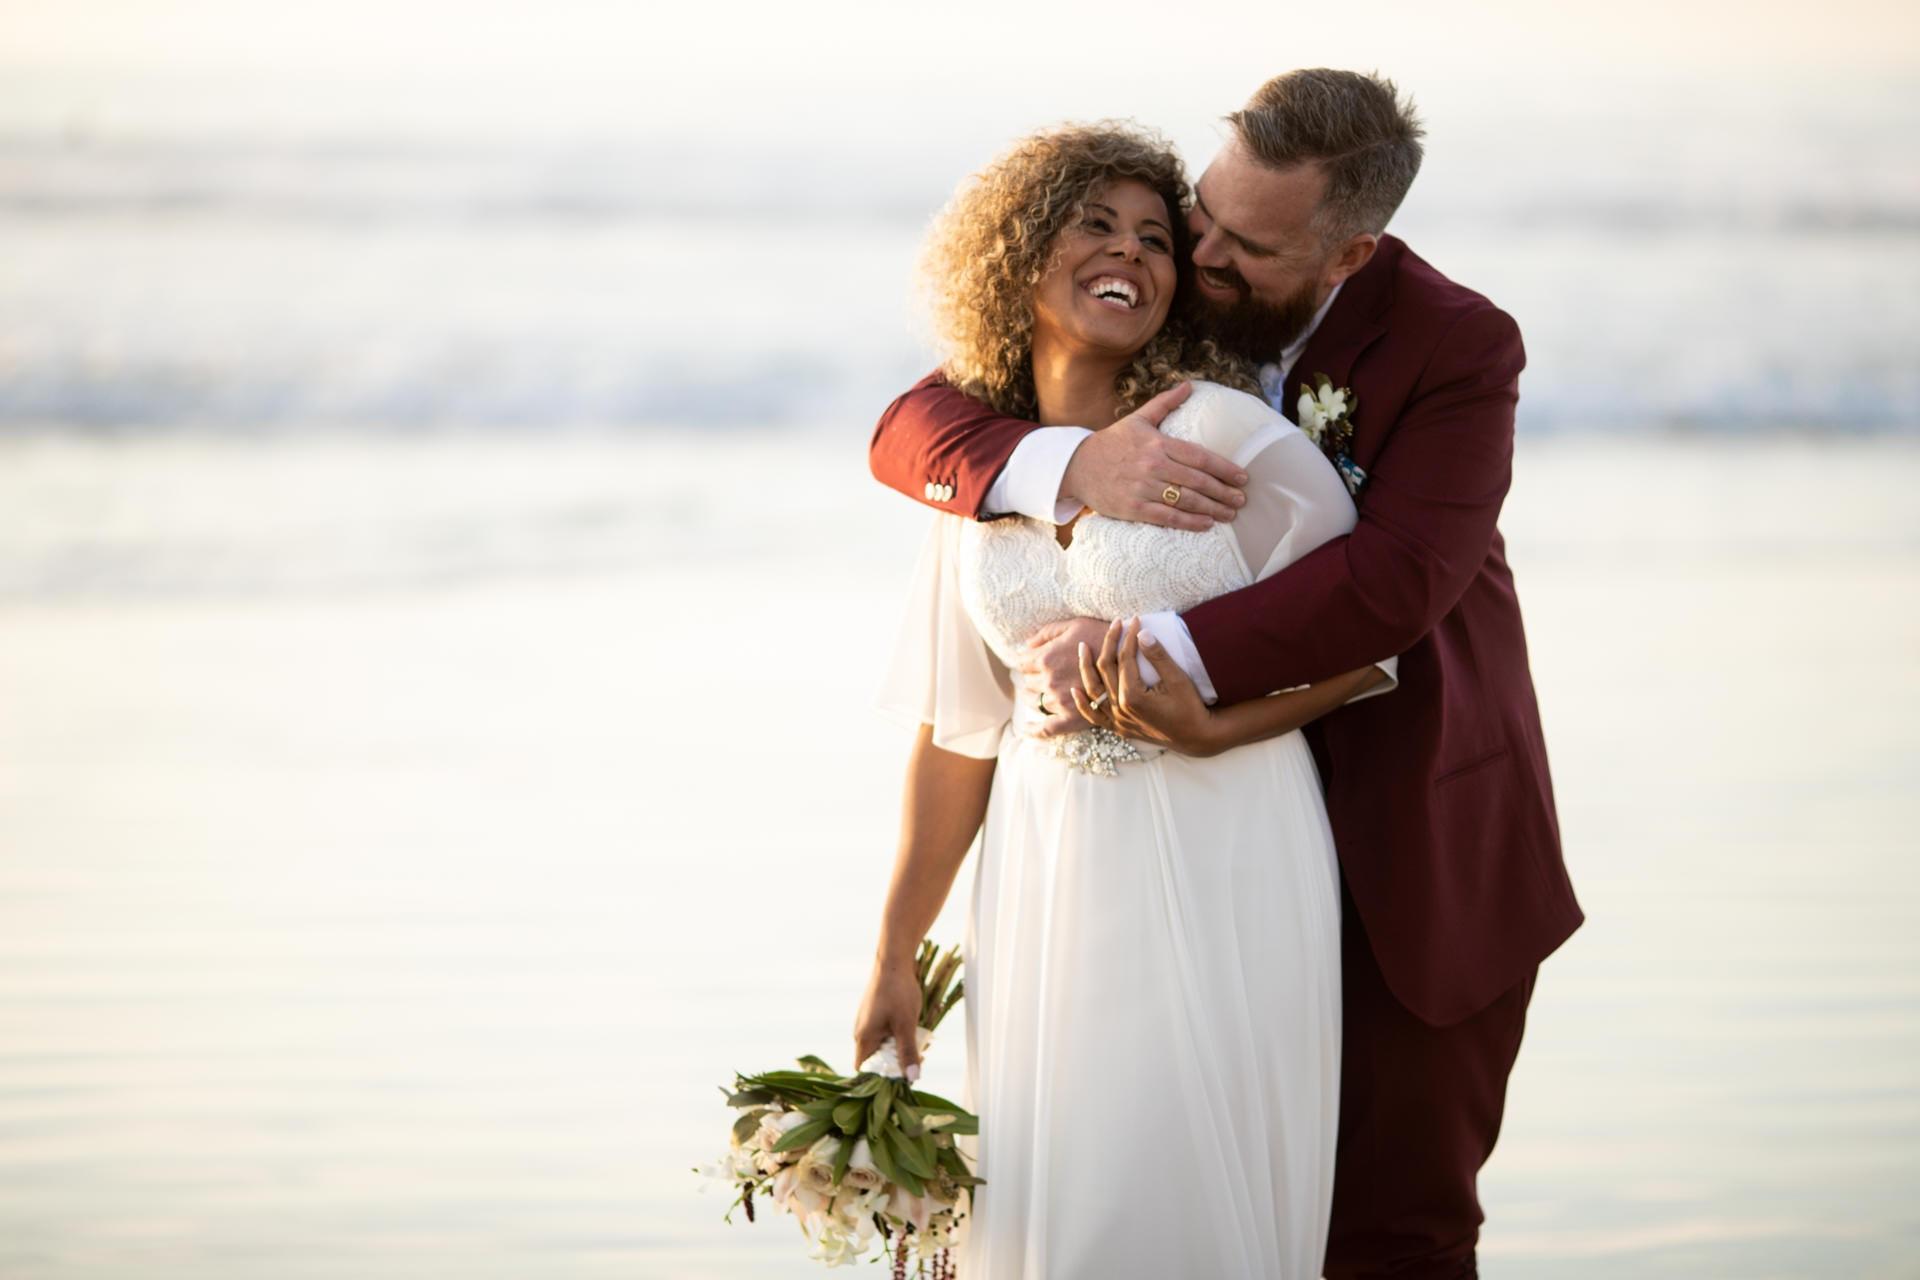 Gerusa Eric La Jolla Beach Wedding by Faces Photography